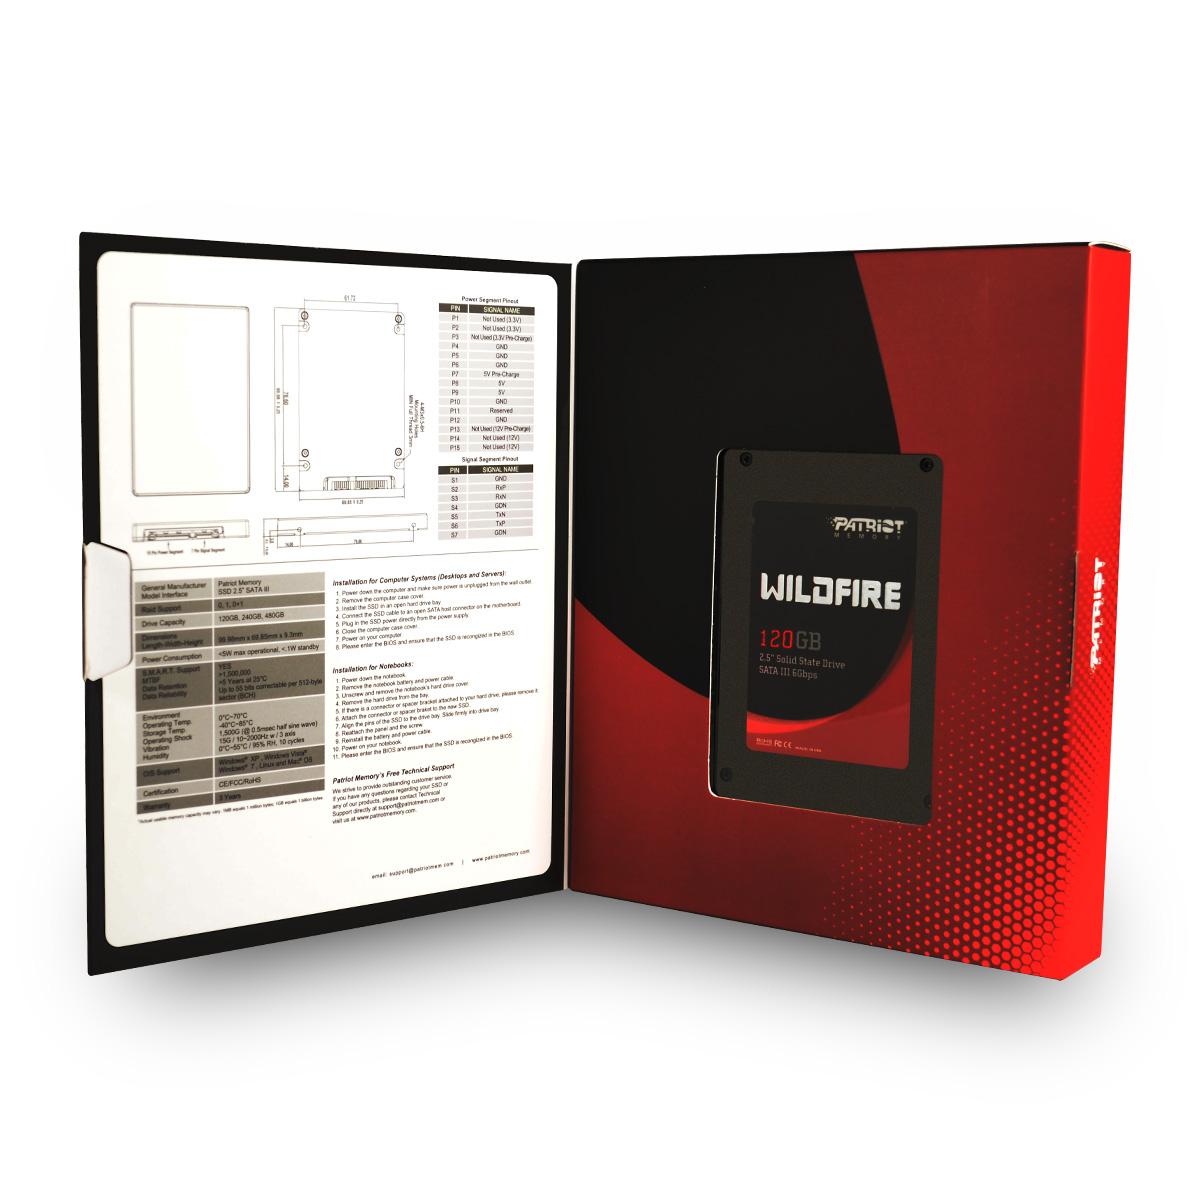 Patriot Memory WildFire 120GB SSD